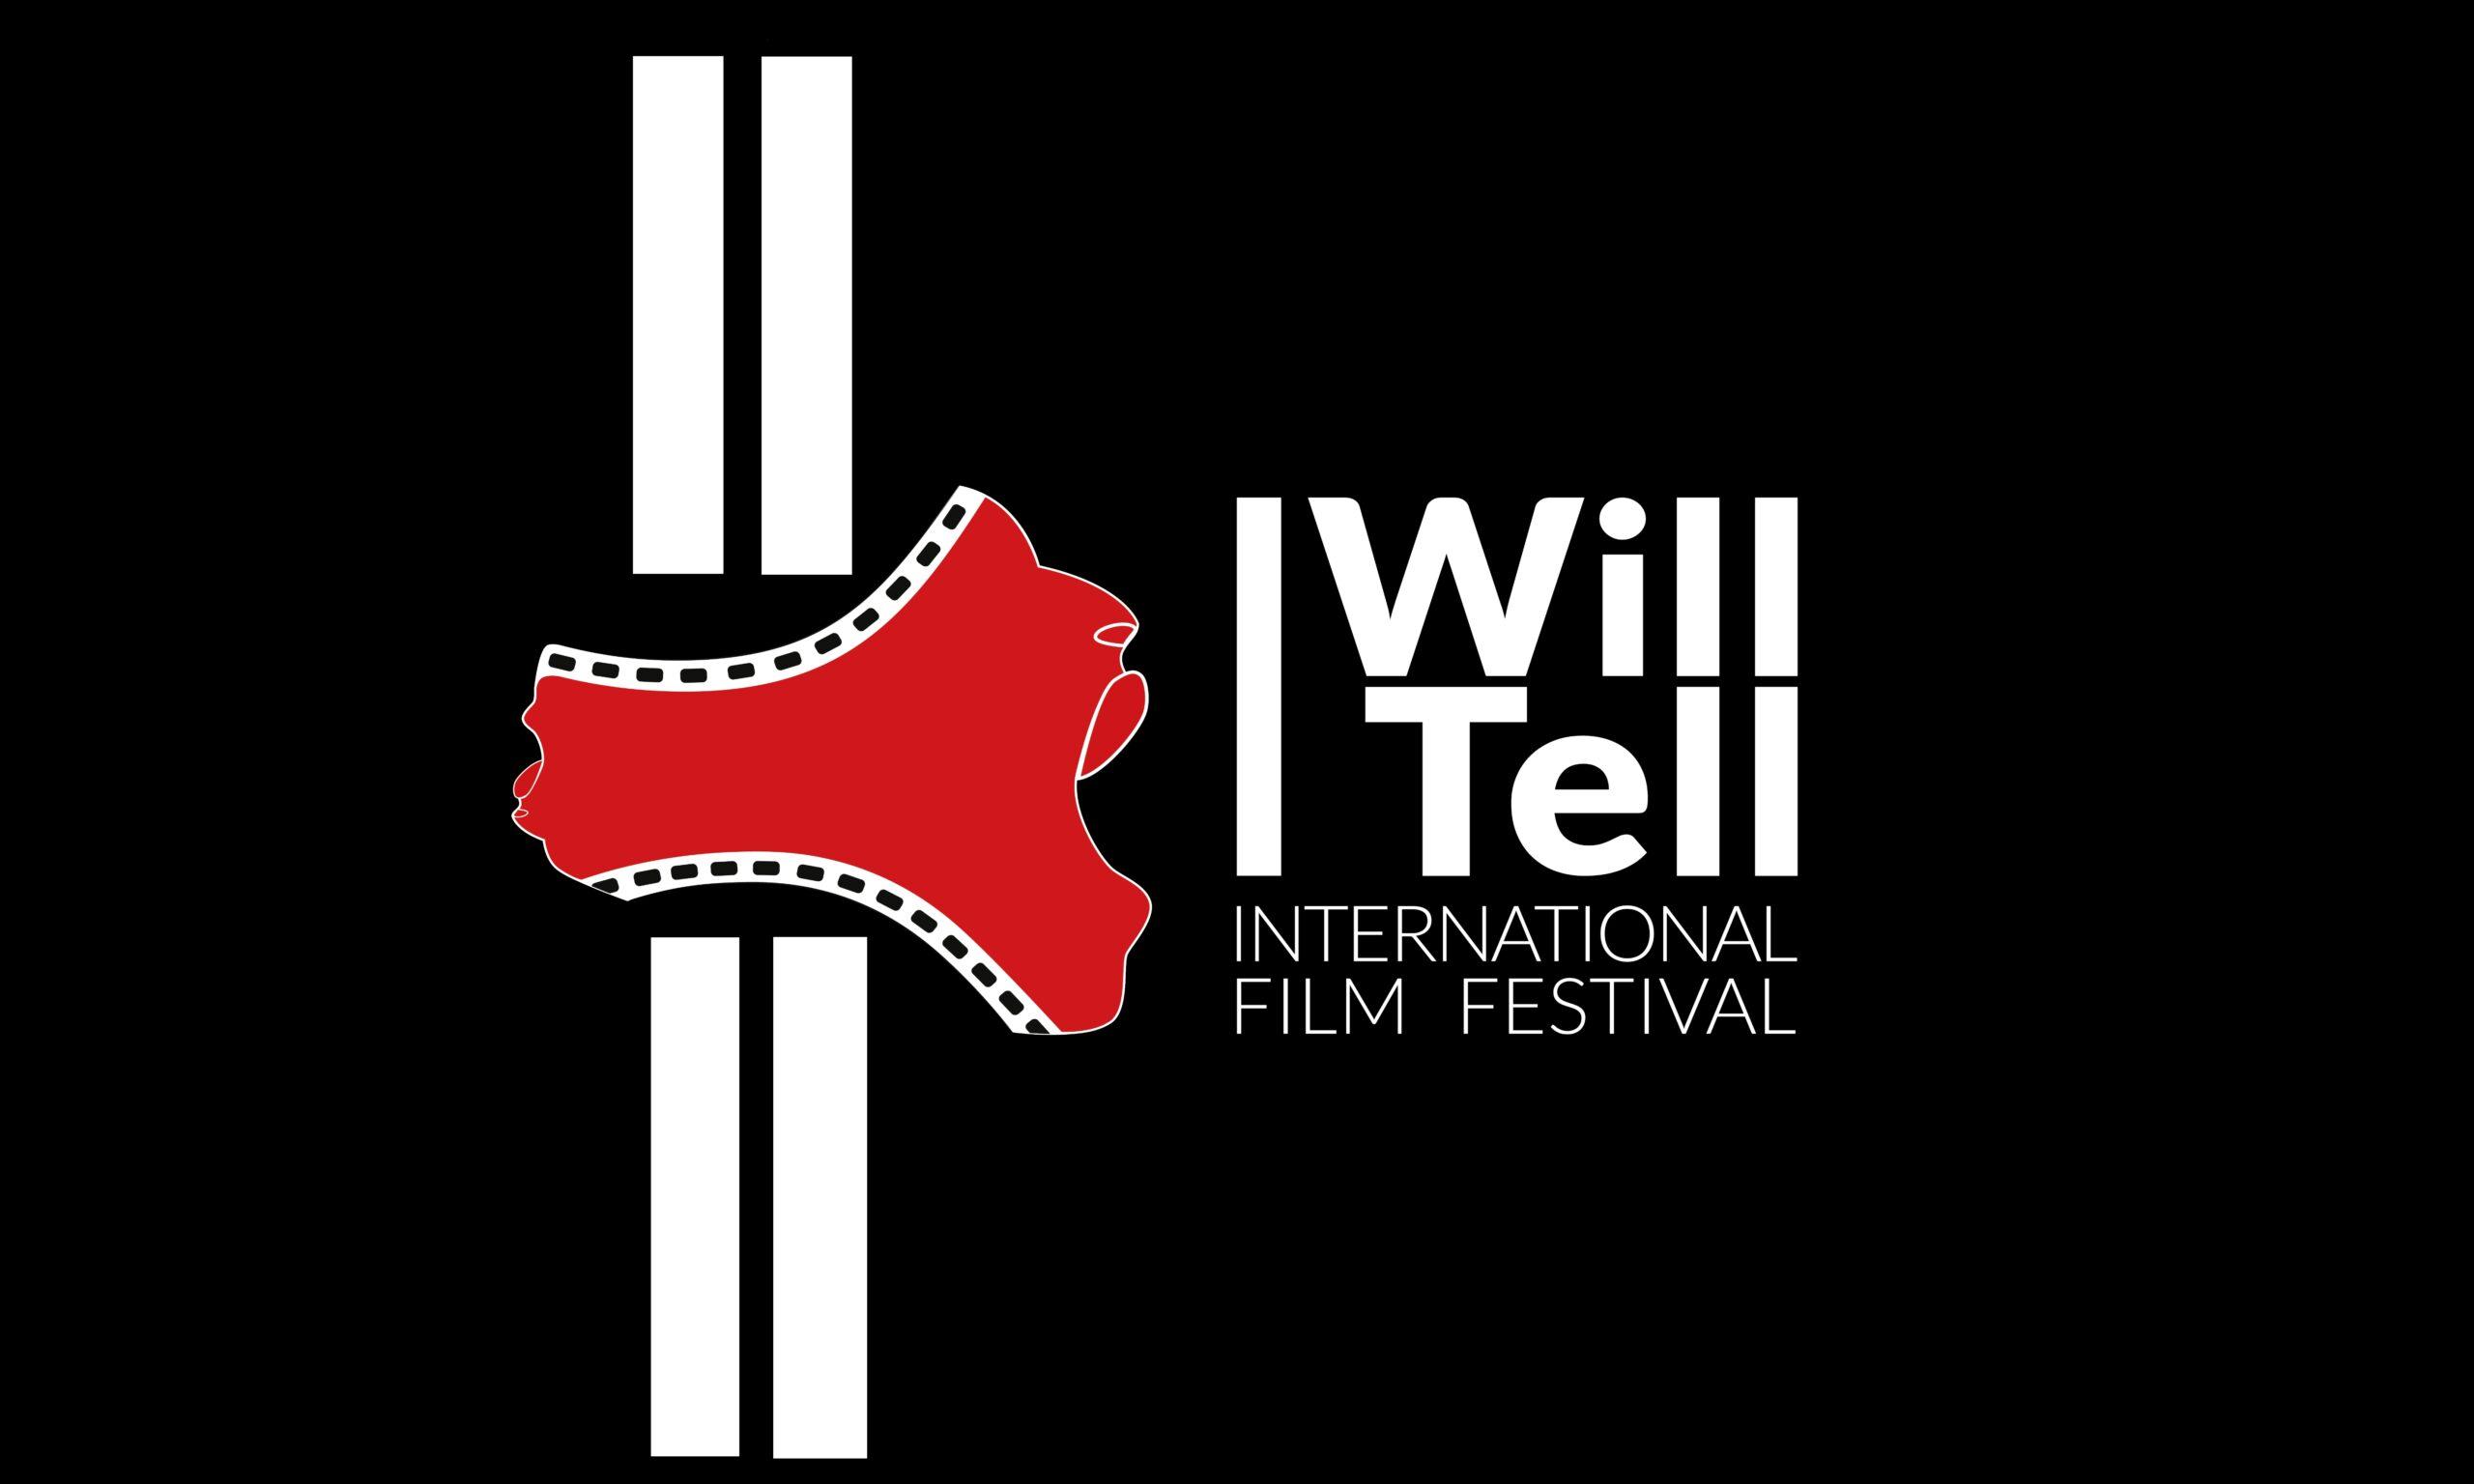 I Will Tell International Film Festival - Celebrate. Challenge. Catalyse Change